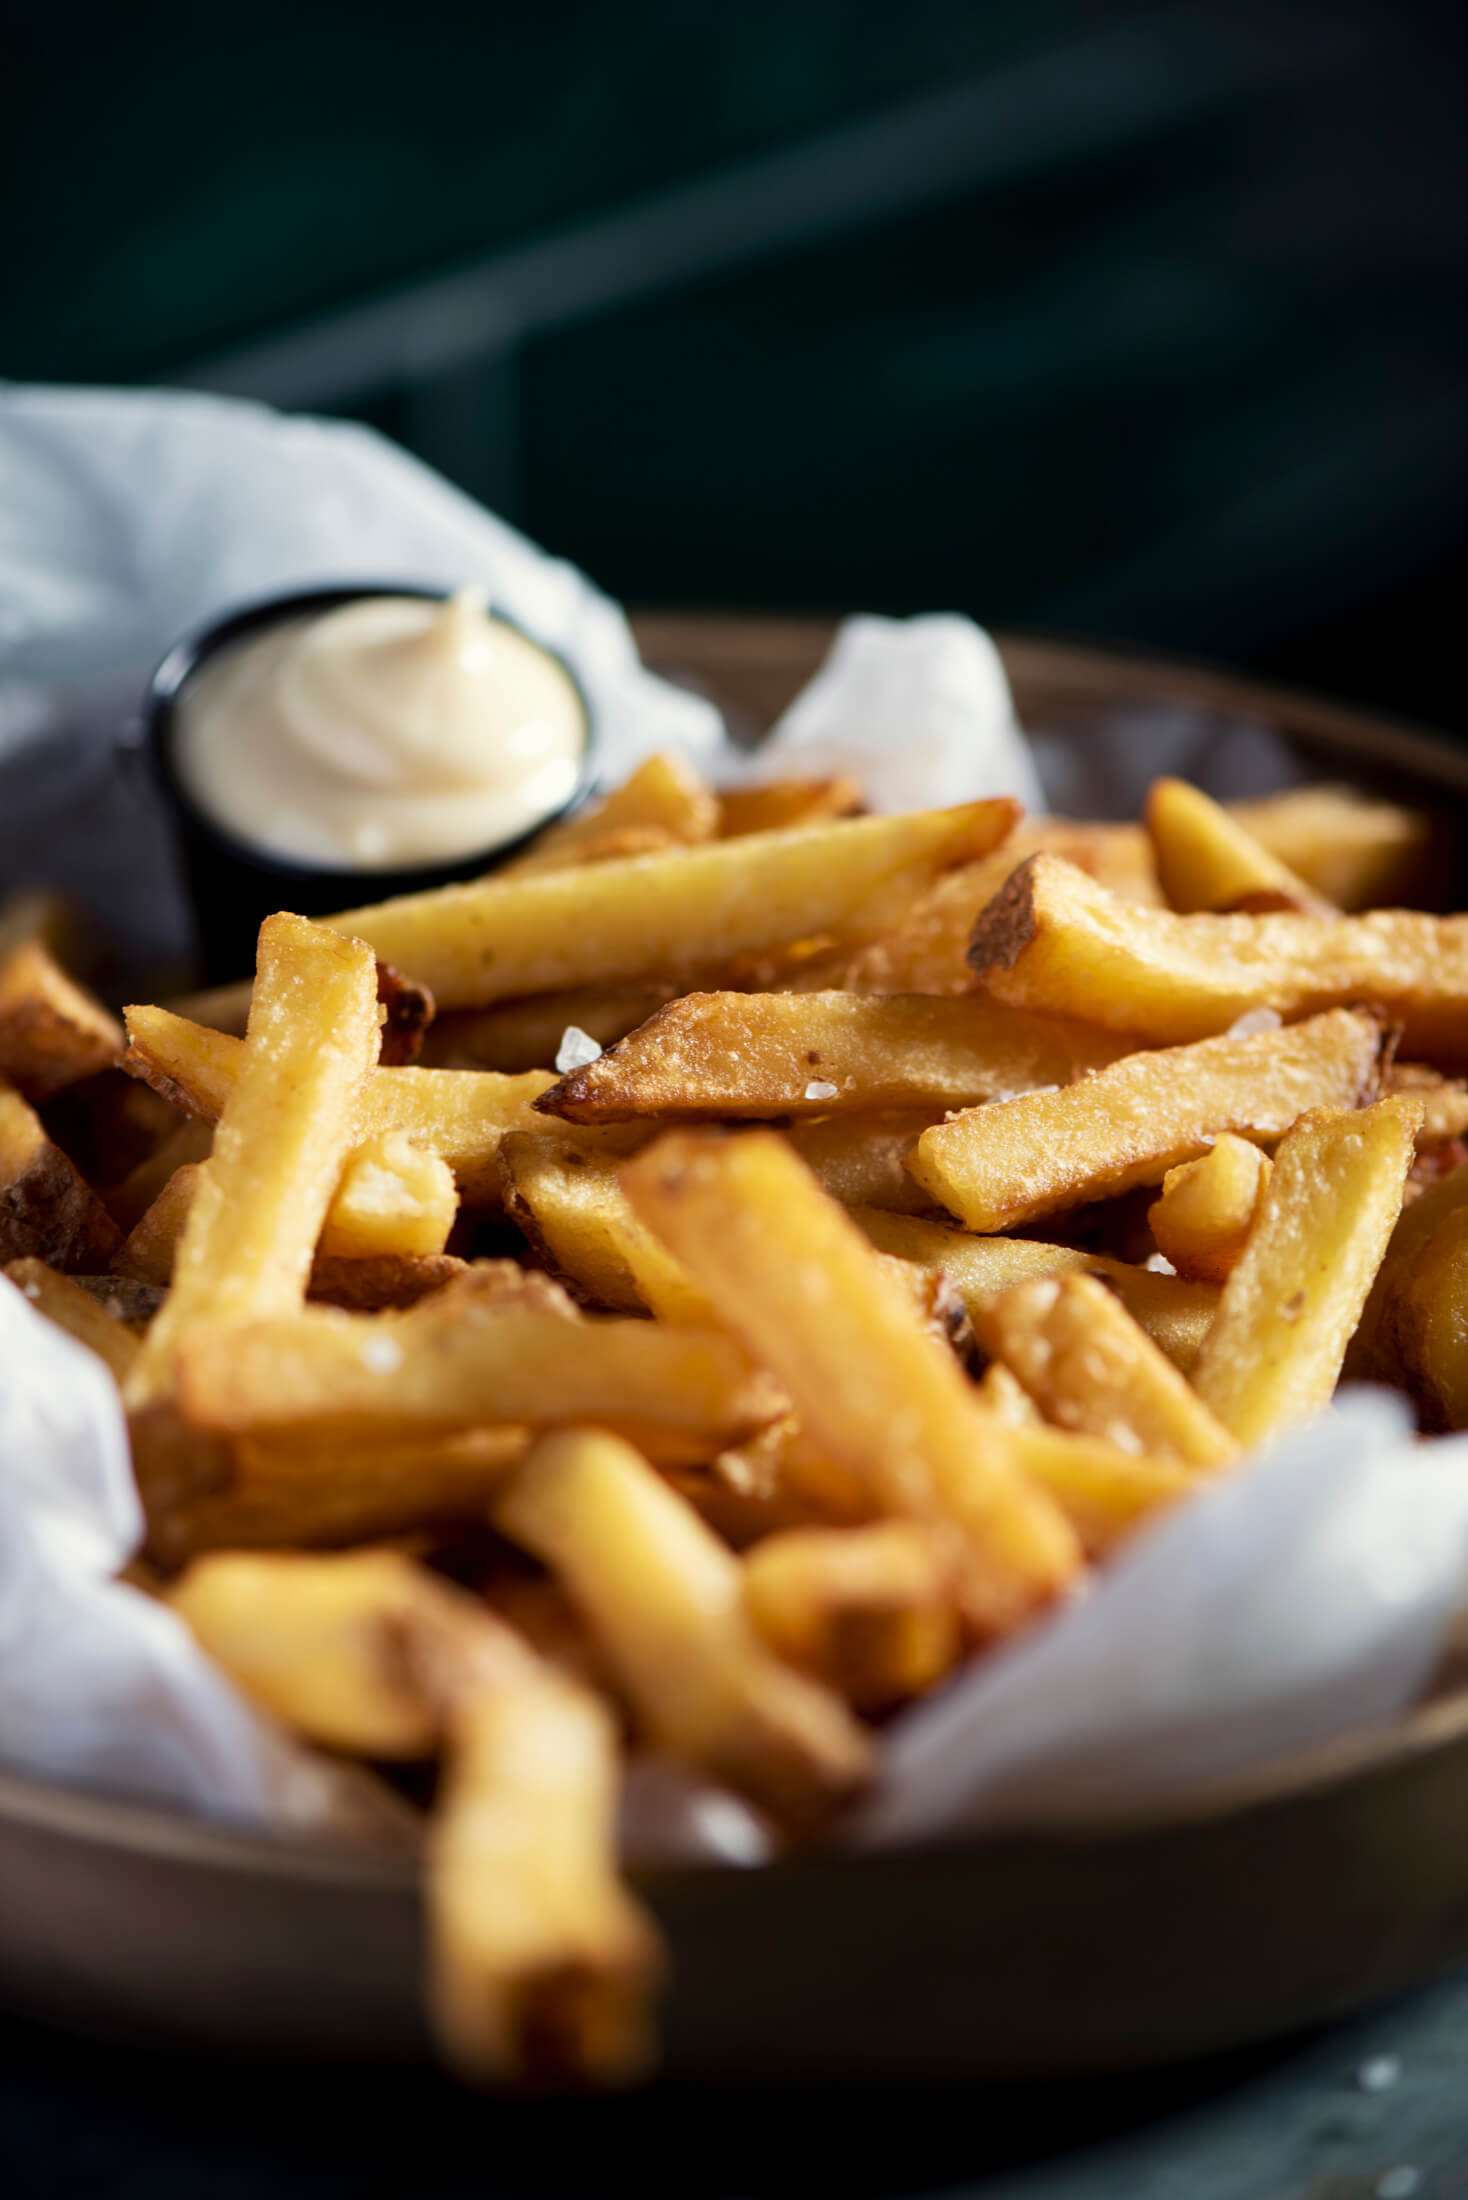 grizzl-handmade-fries.jpg